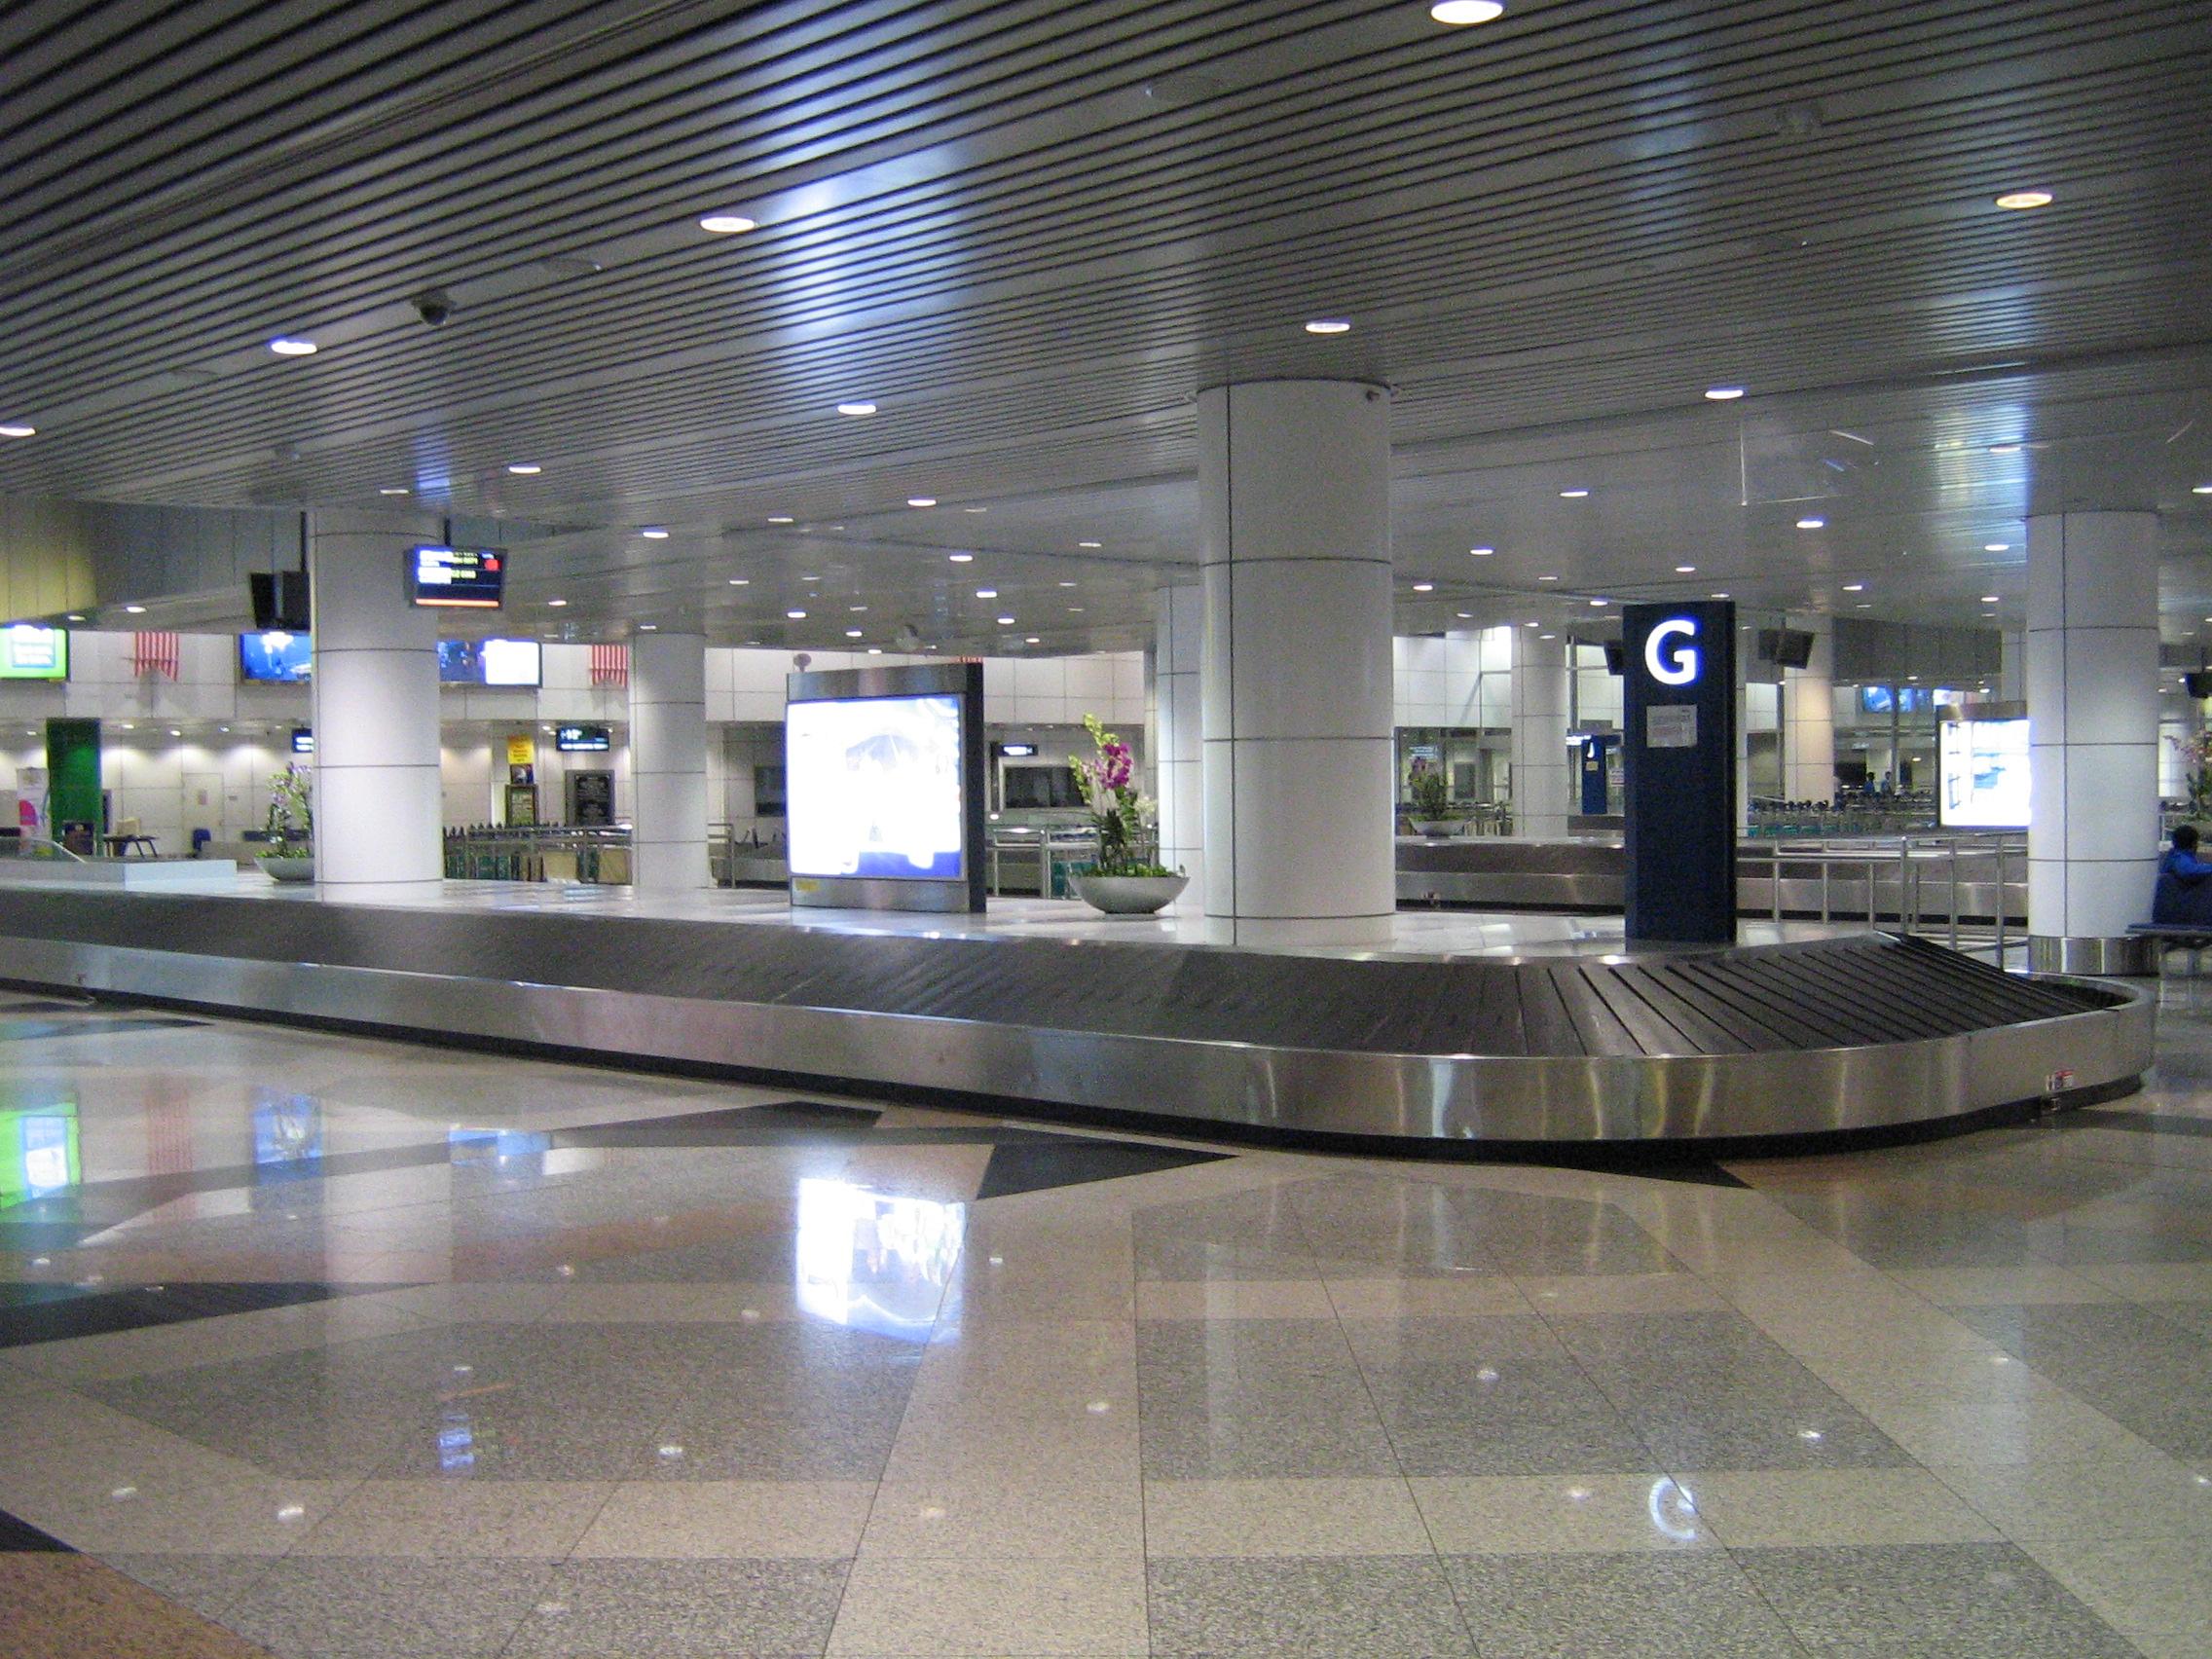 Bangkok Airport Hotel Hourly Rate